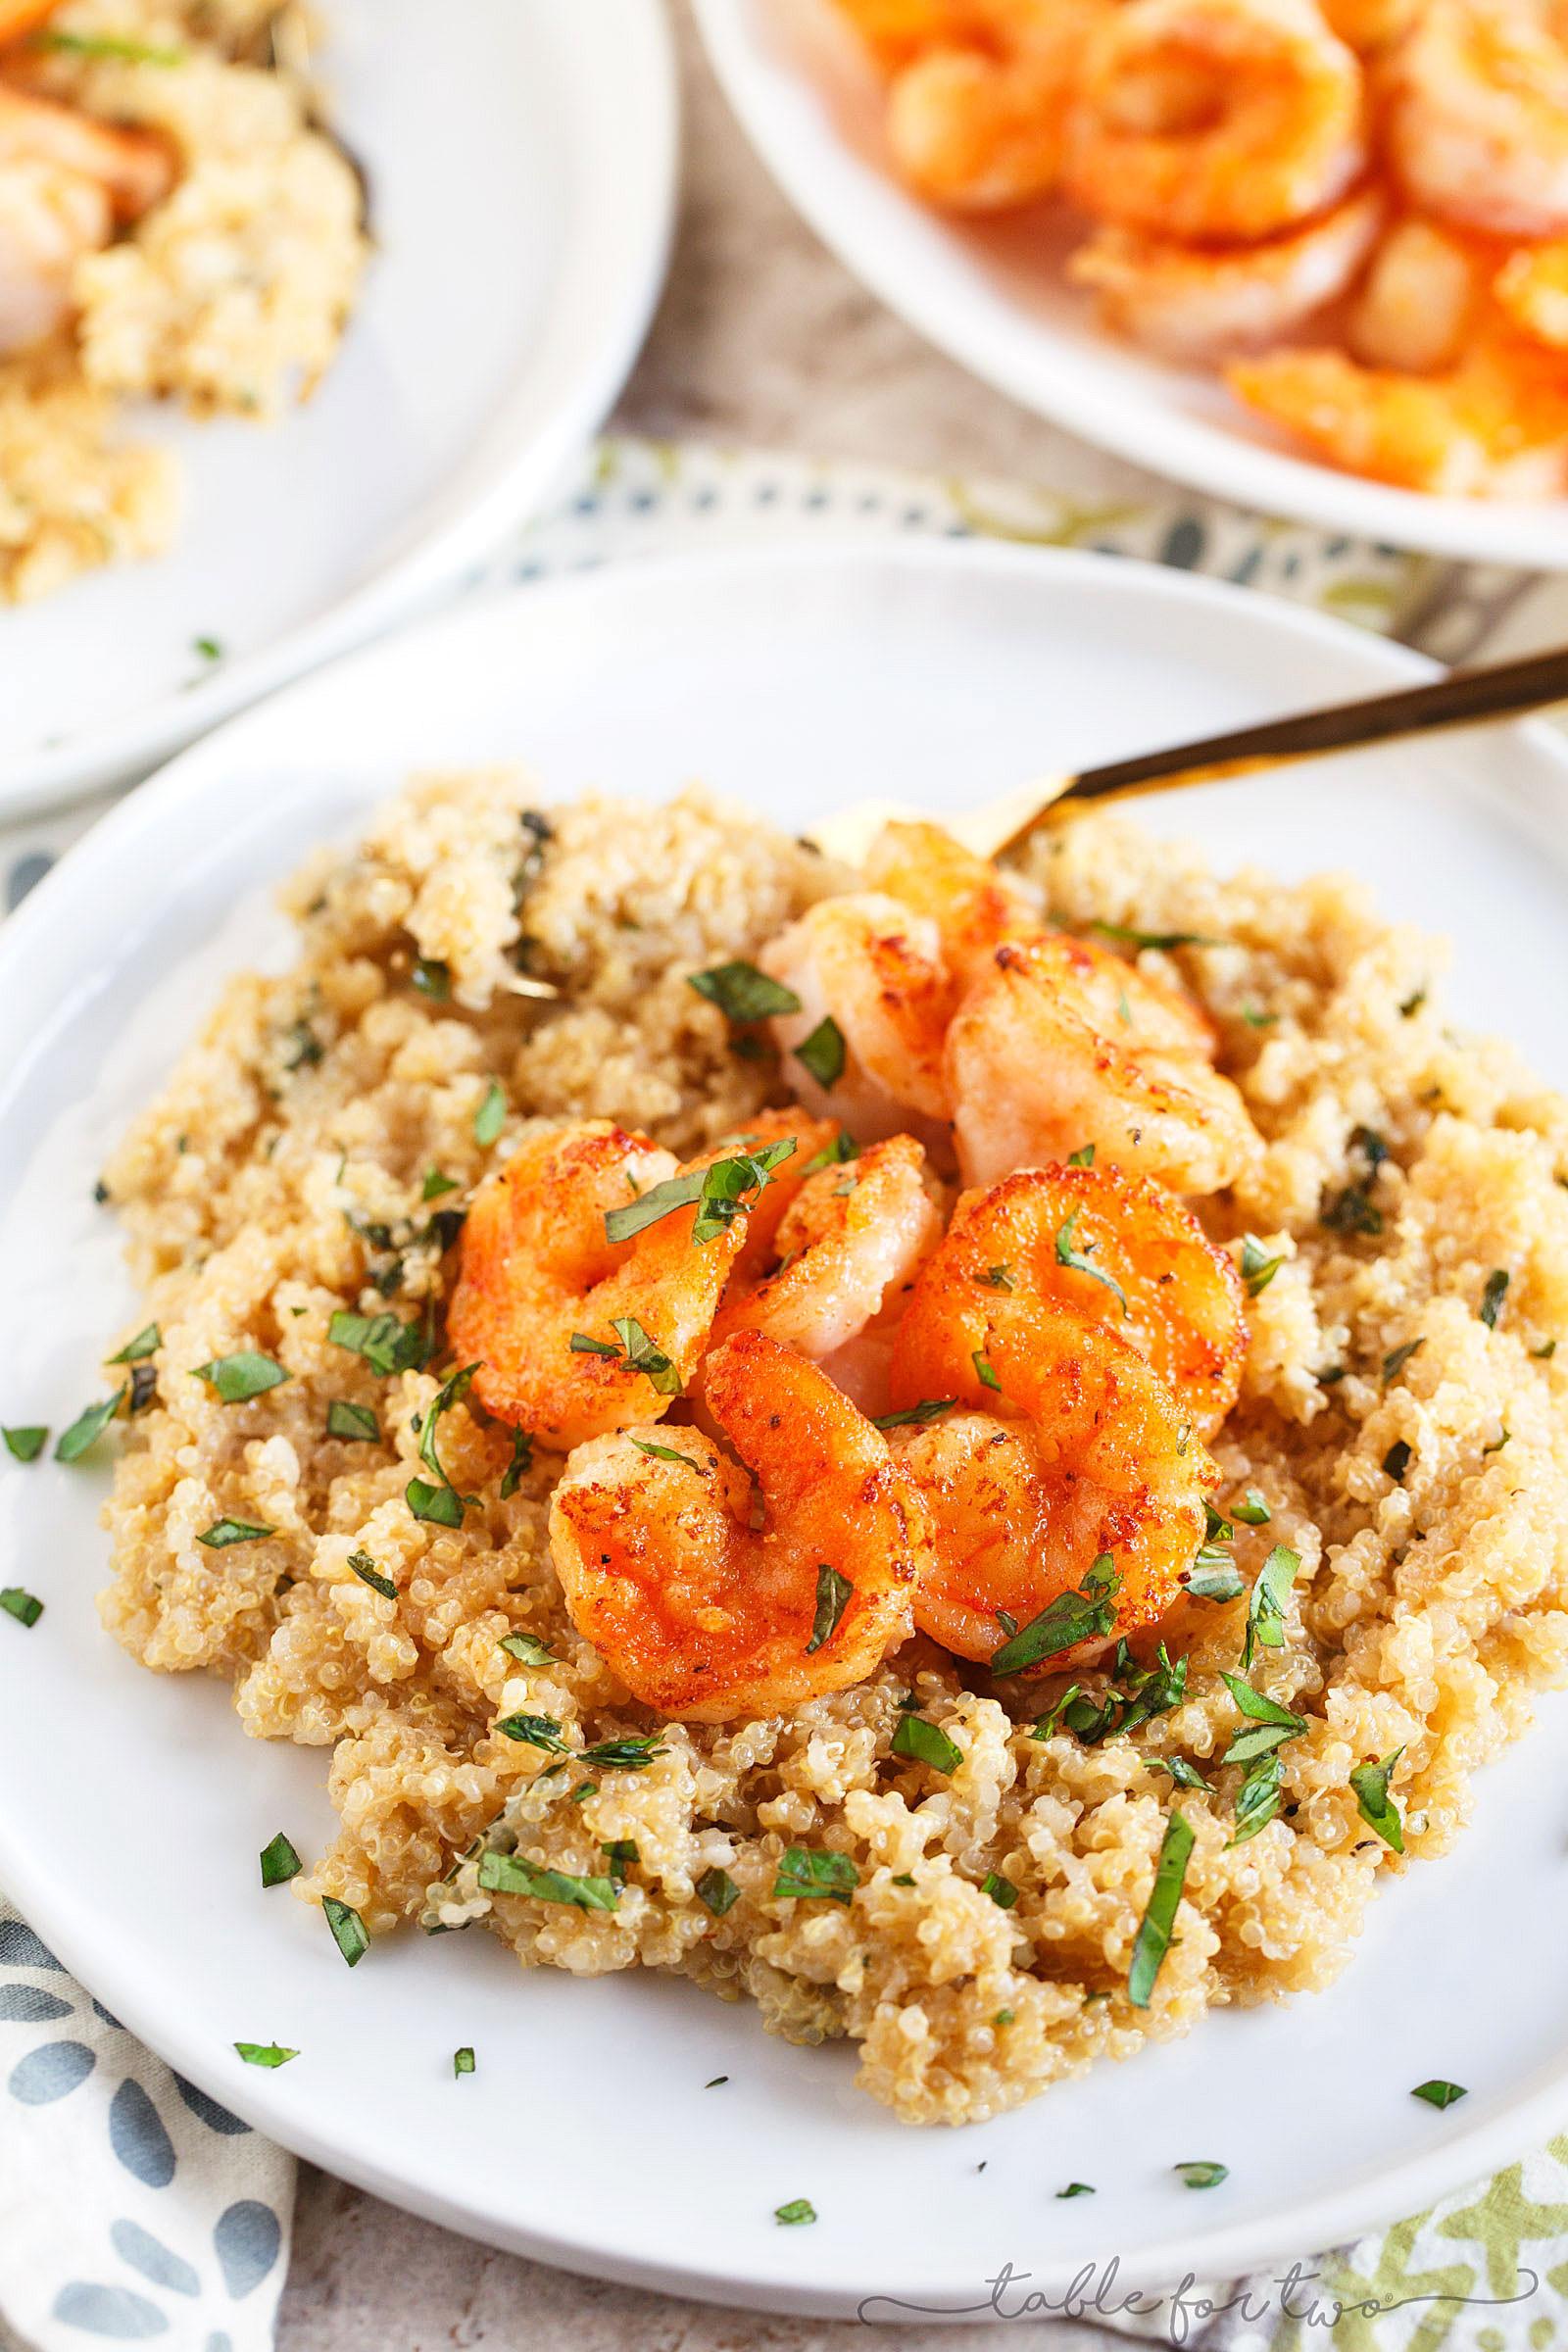 Shrimp And Quinoa  Garlic Butter Shrimp and Quinoa Table for Two